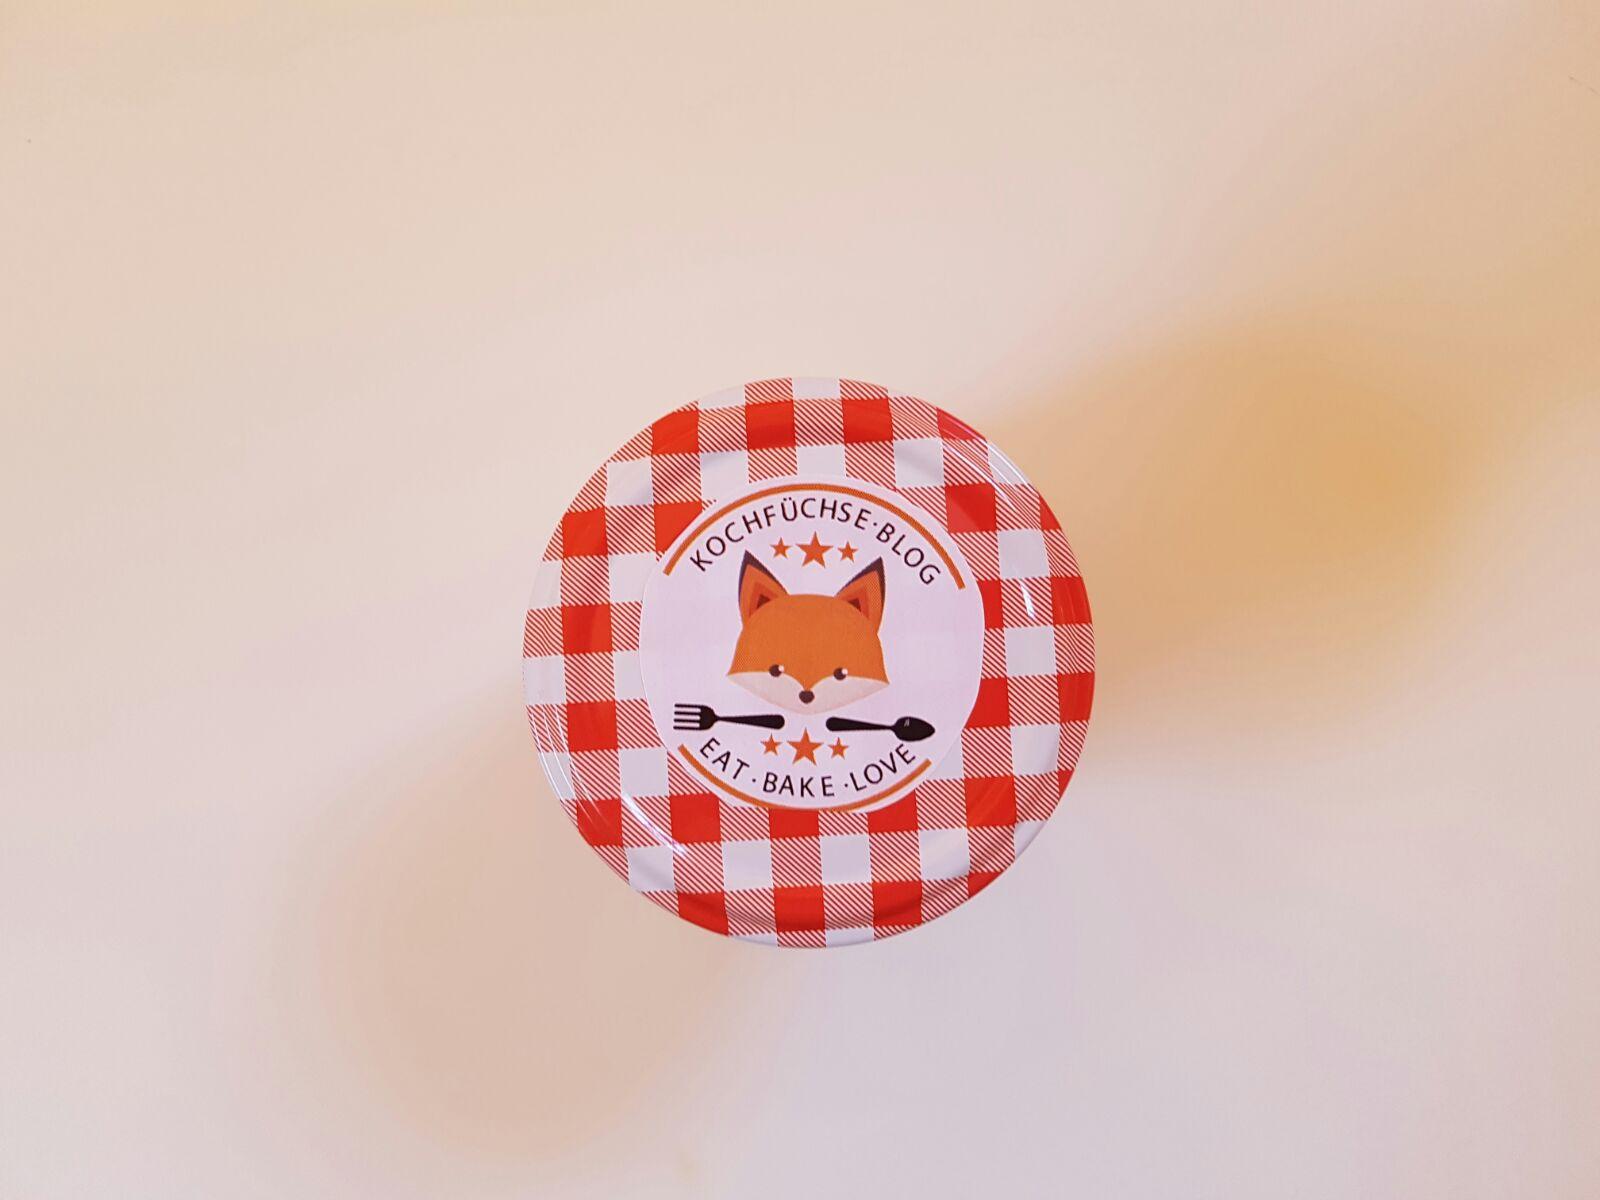 Kochfüchse